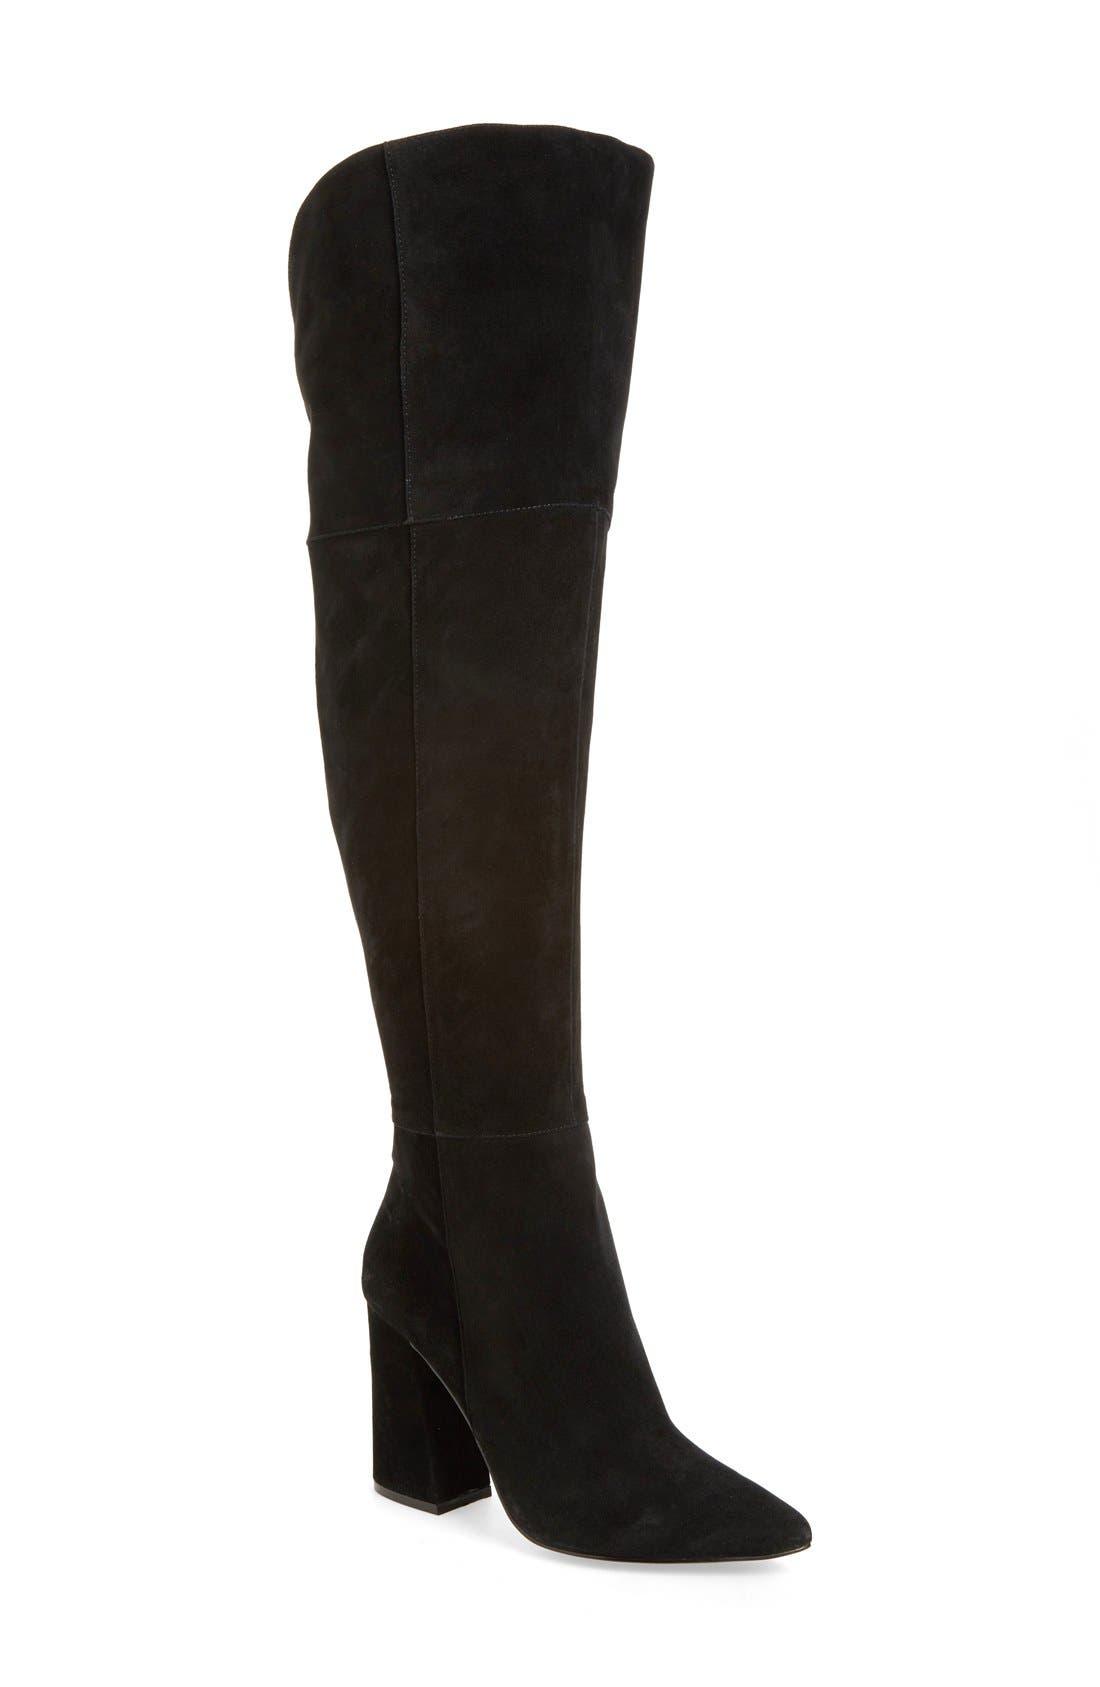 'Saffron' Over the Knee Boot,                         Main,                         color, BLACK SUEDE